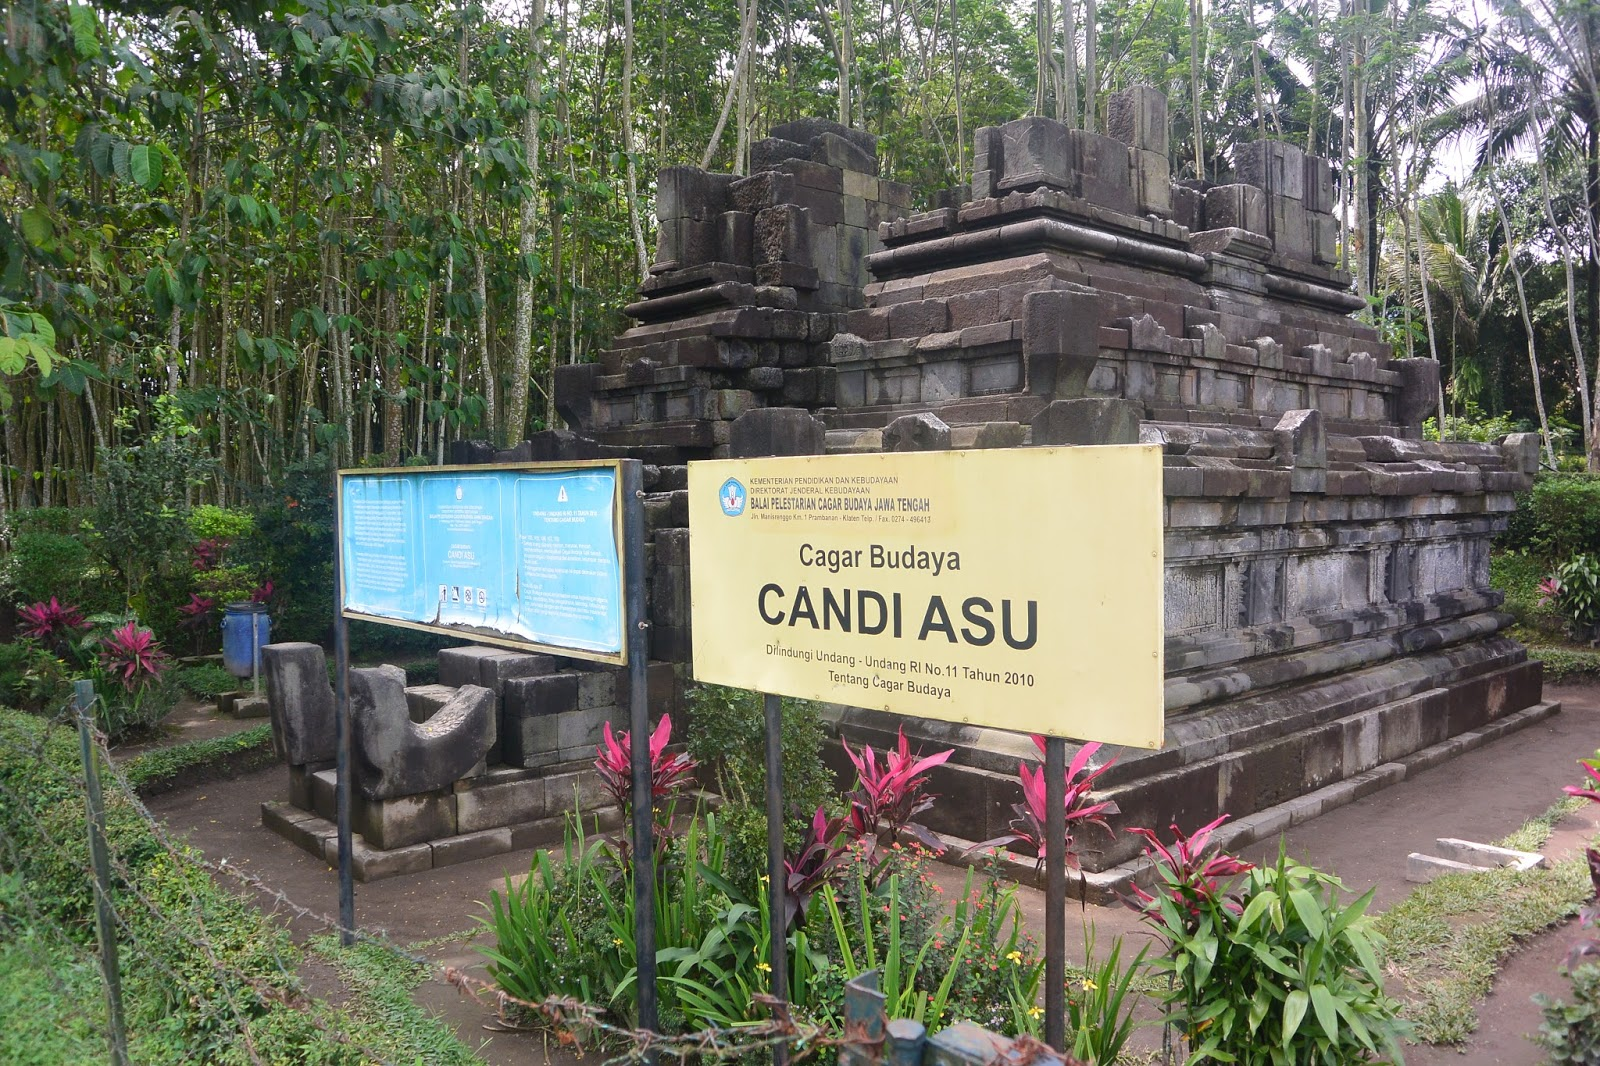 Novo Olshop Candi Asu Nama Sebuah Peninggalan Budaya Hindu Terletak